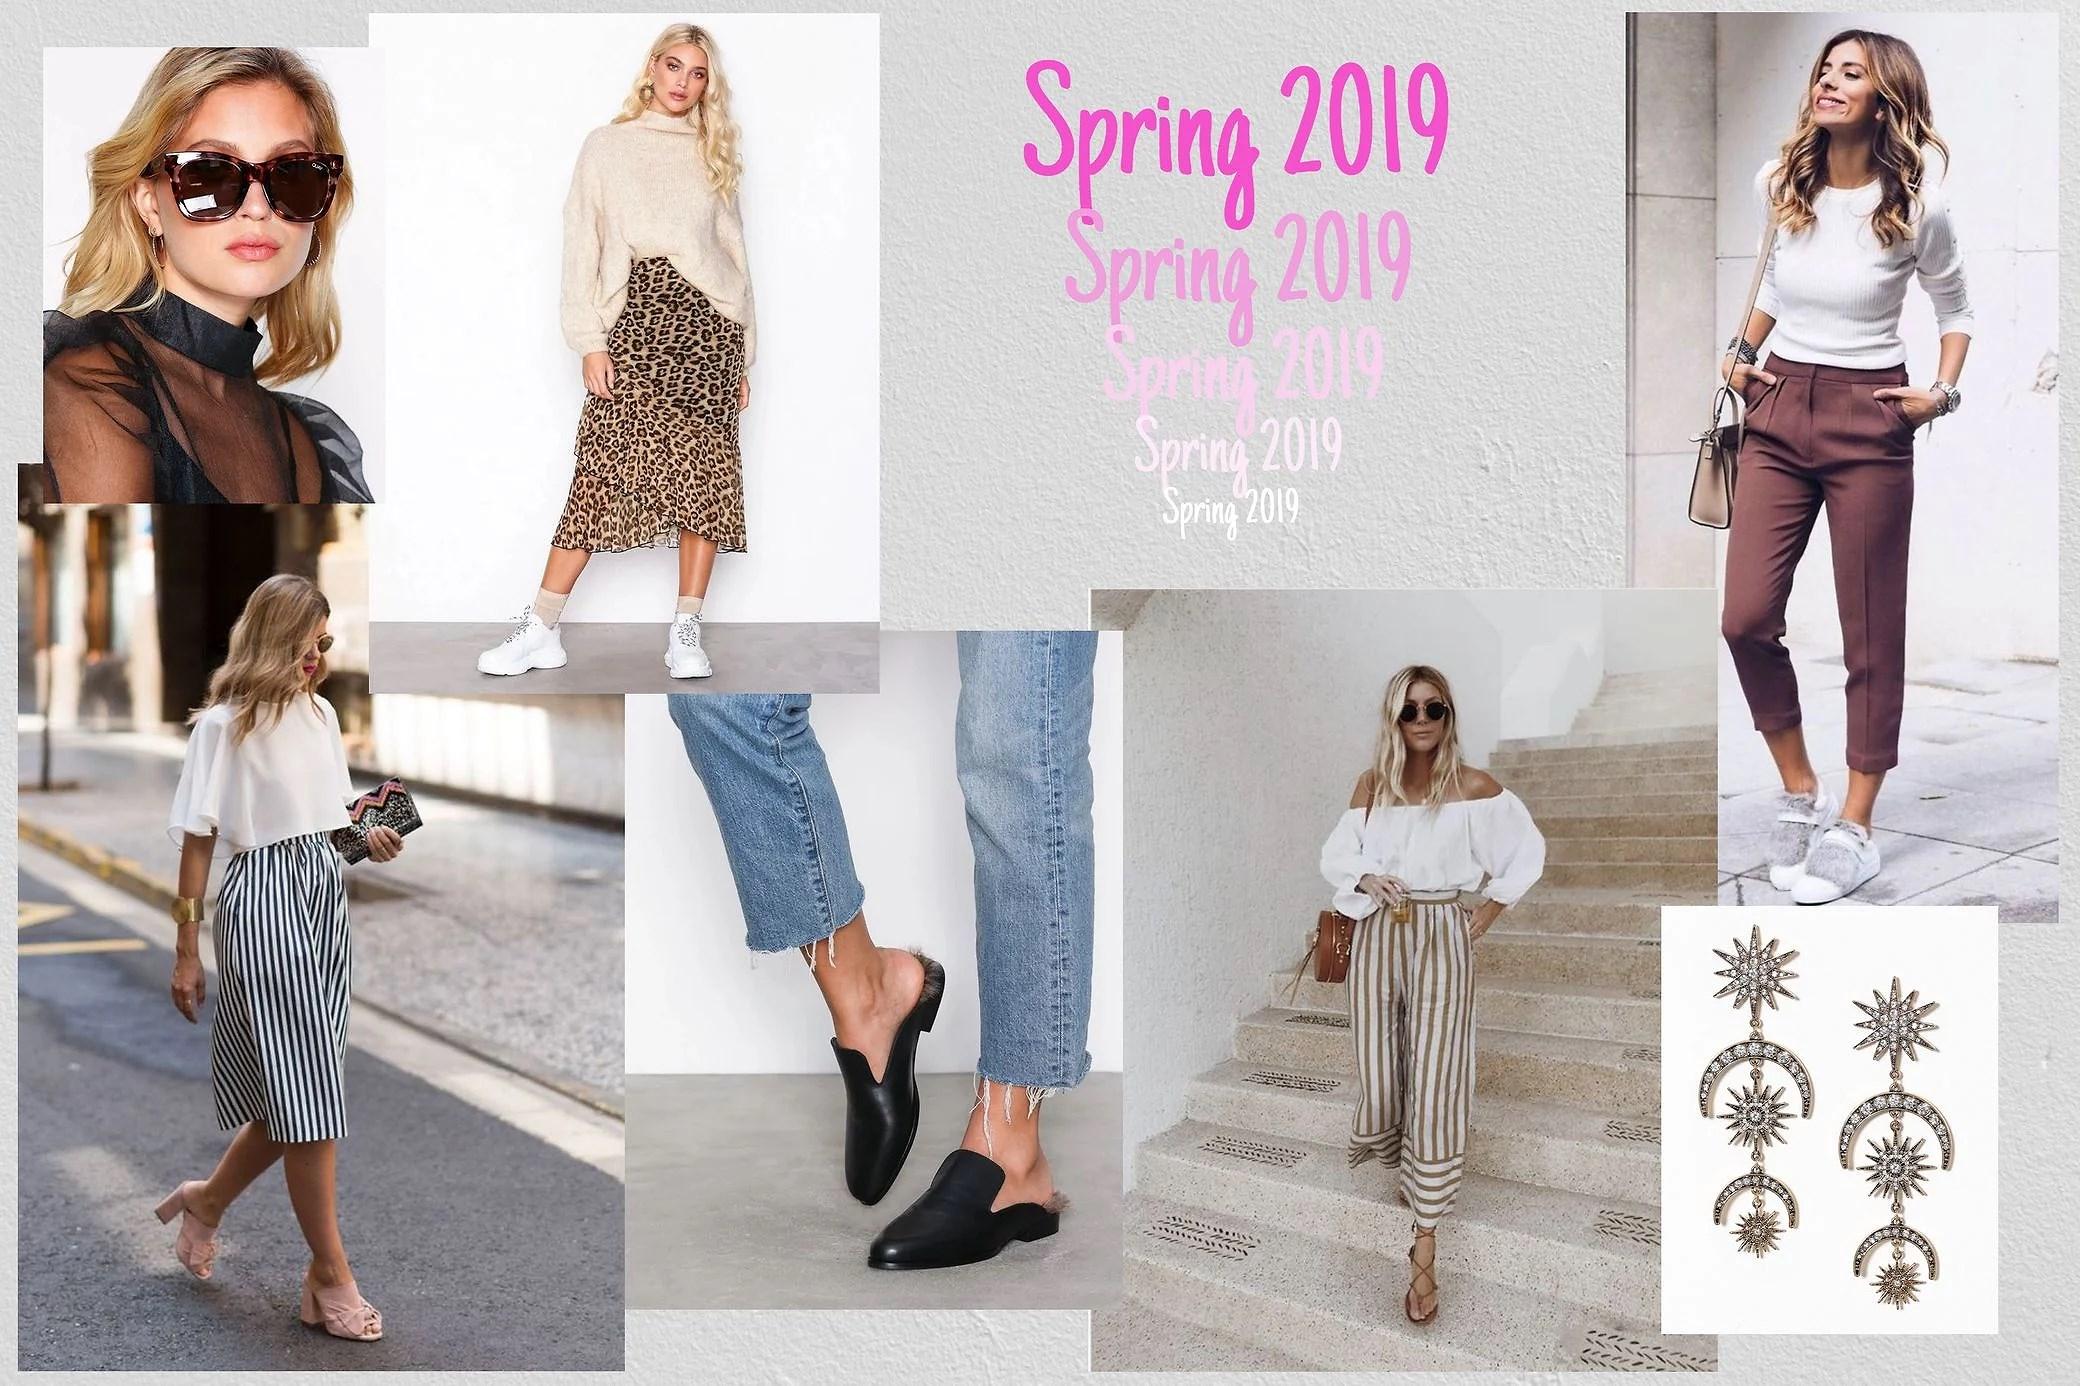 Spring inspiration 2019